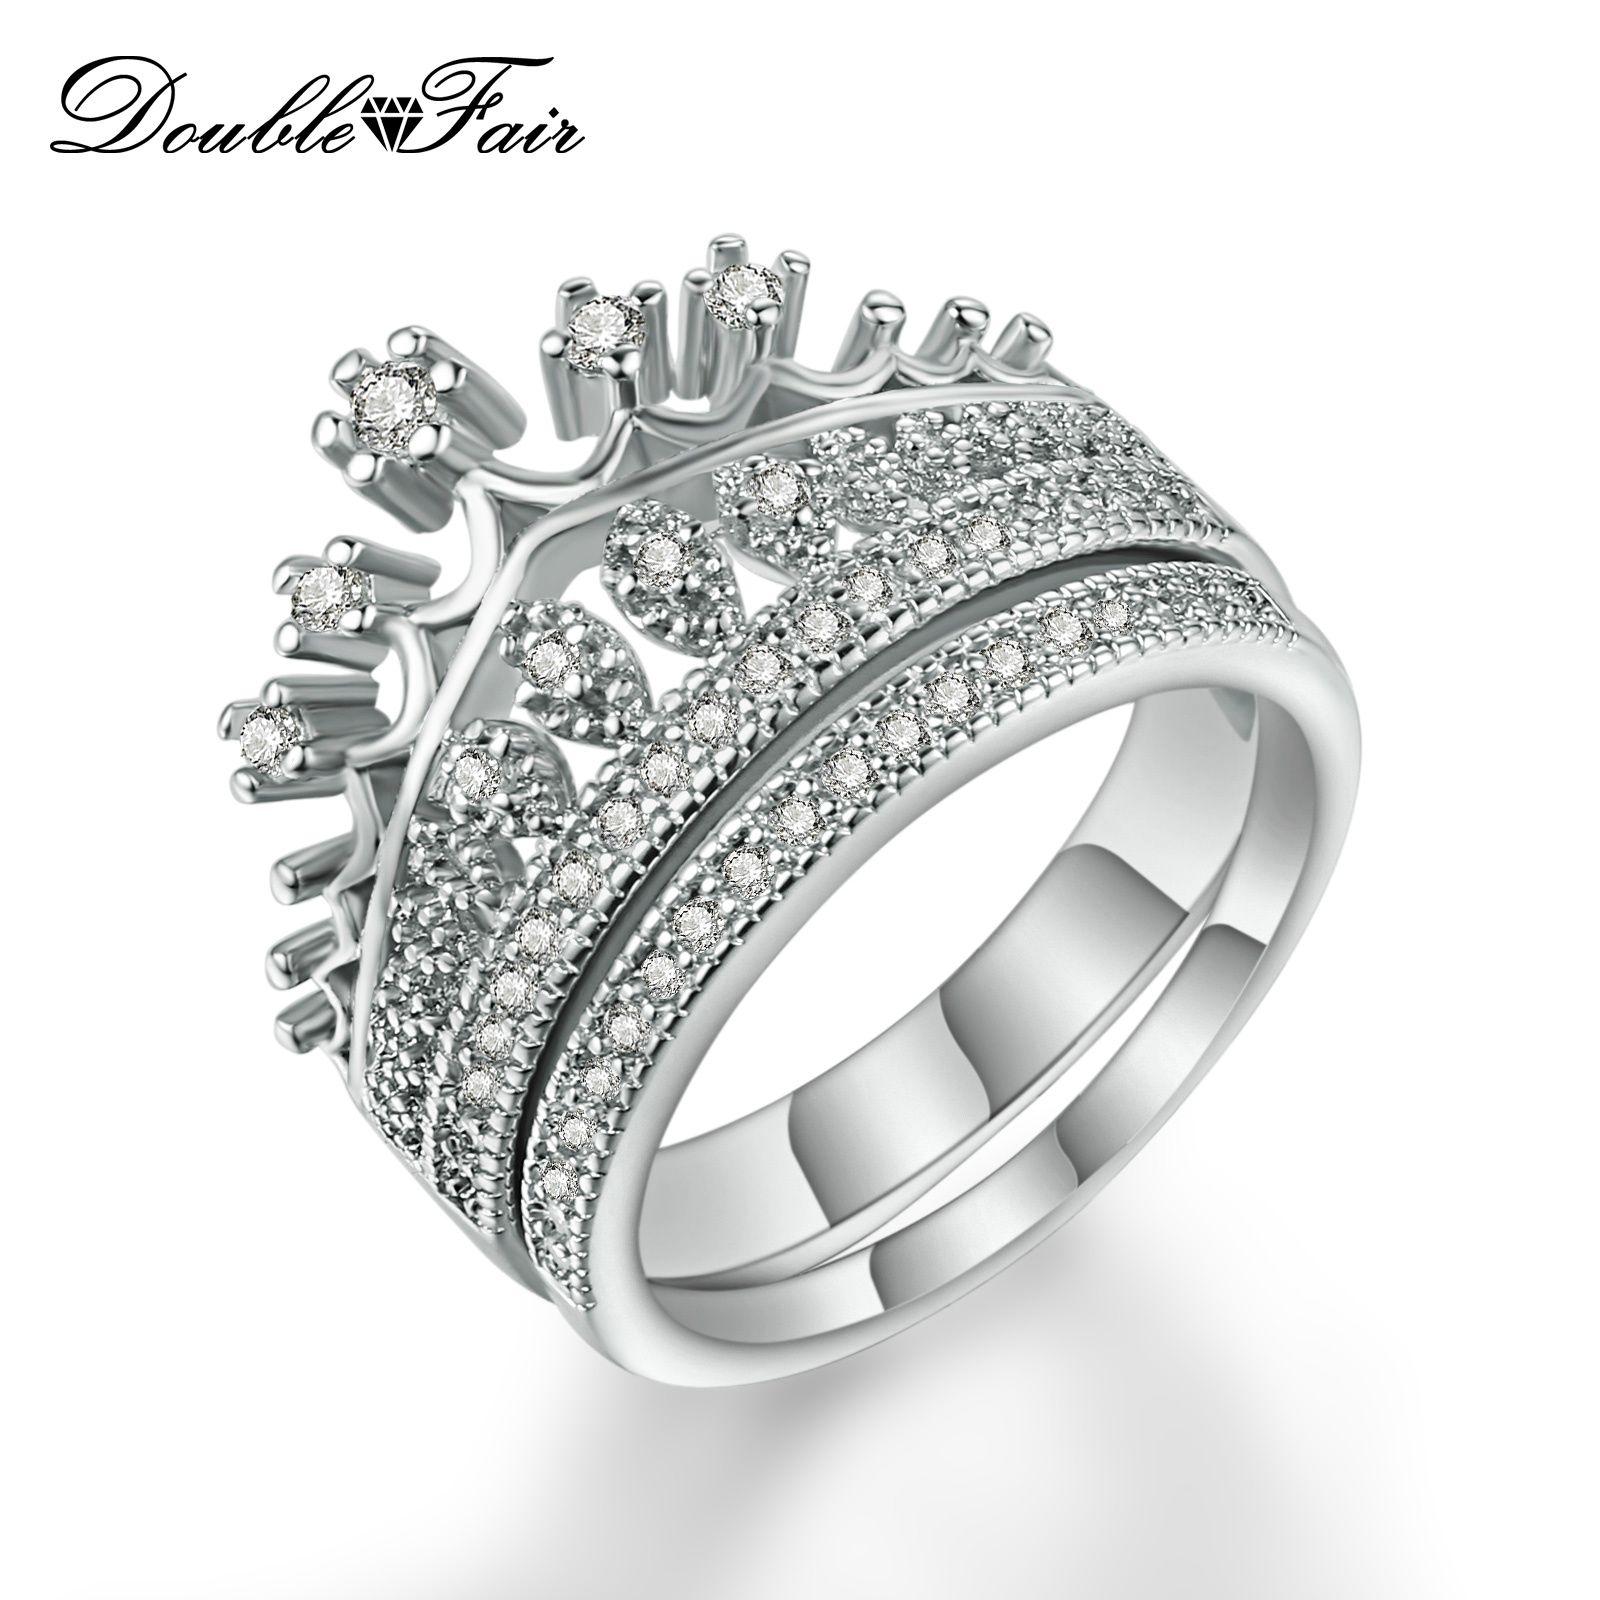 1d73b6e8fade Compre Calidad Superior De Imitación De Cristal Oro Blanco Plateado  Princesa Corona Conjuntos De Anillo De Bodas Para Las Mujeres De Moda Cubic  Zirconia ...